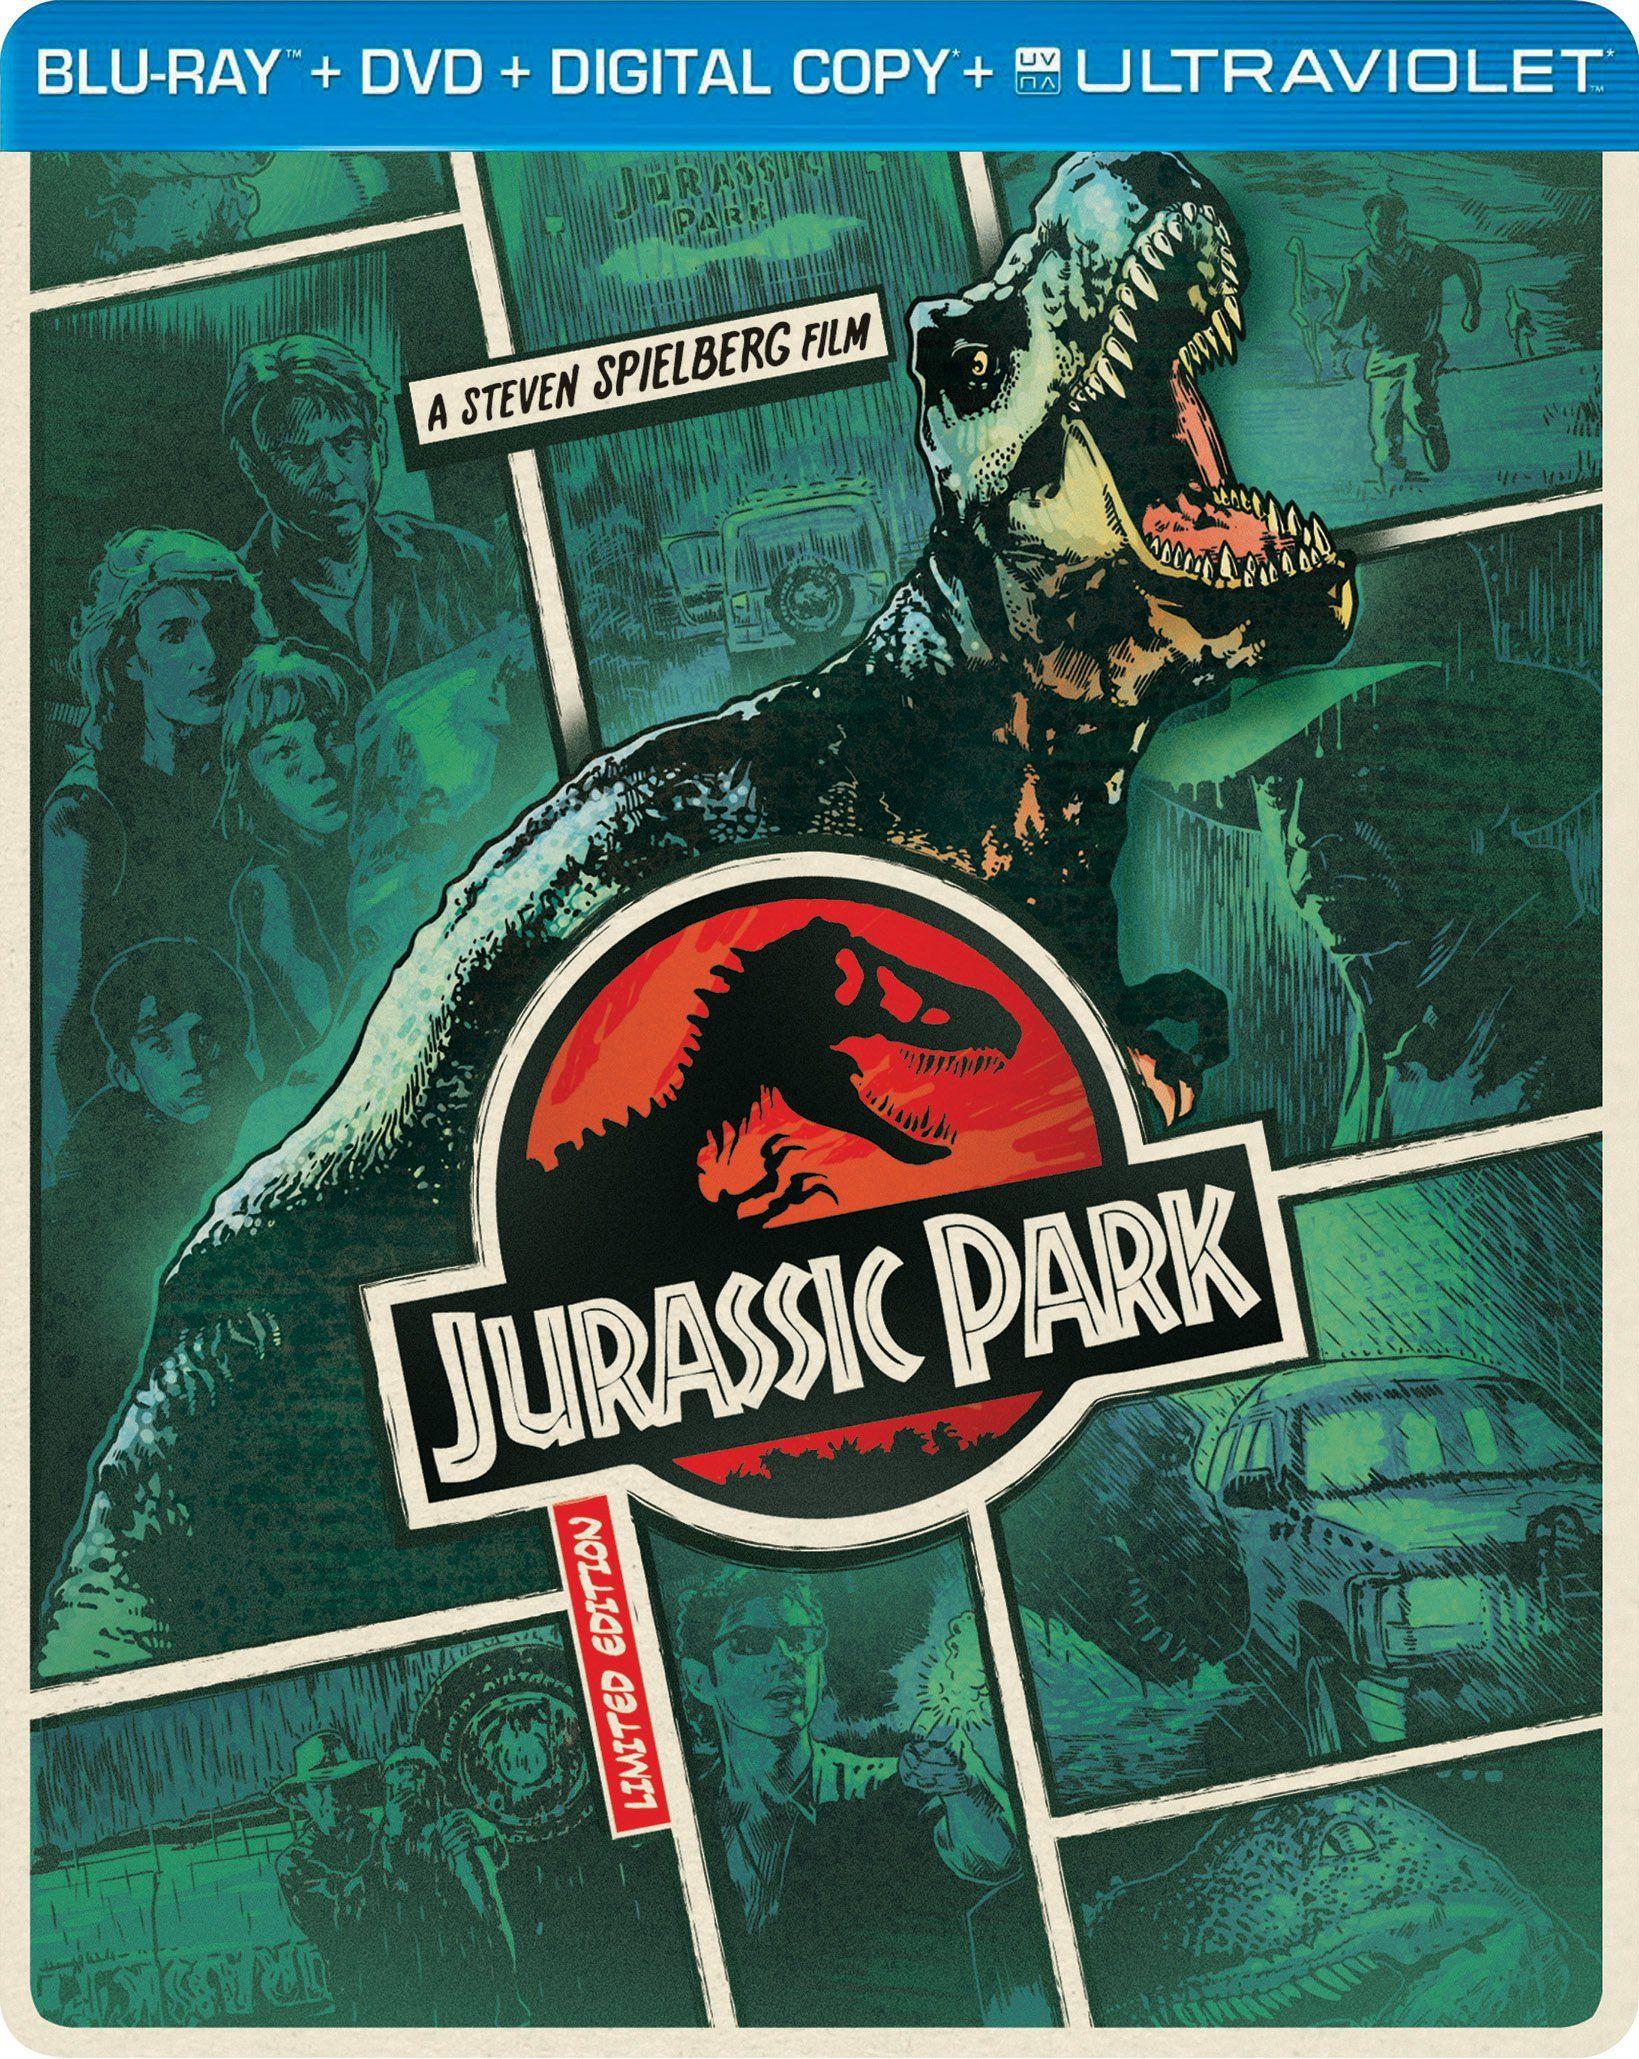 Jurassic Park (Steelbook) (Bluray + DVD